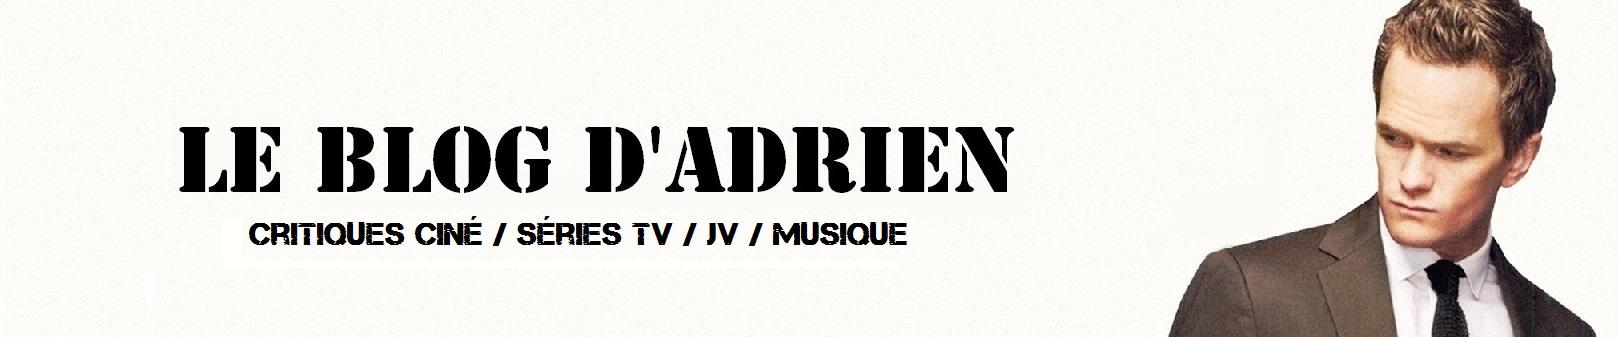 Le blog dAdrien